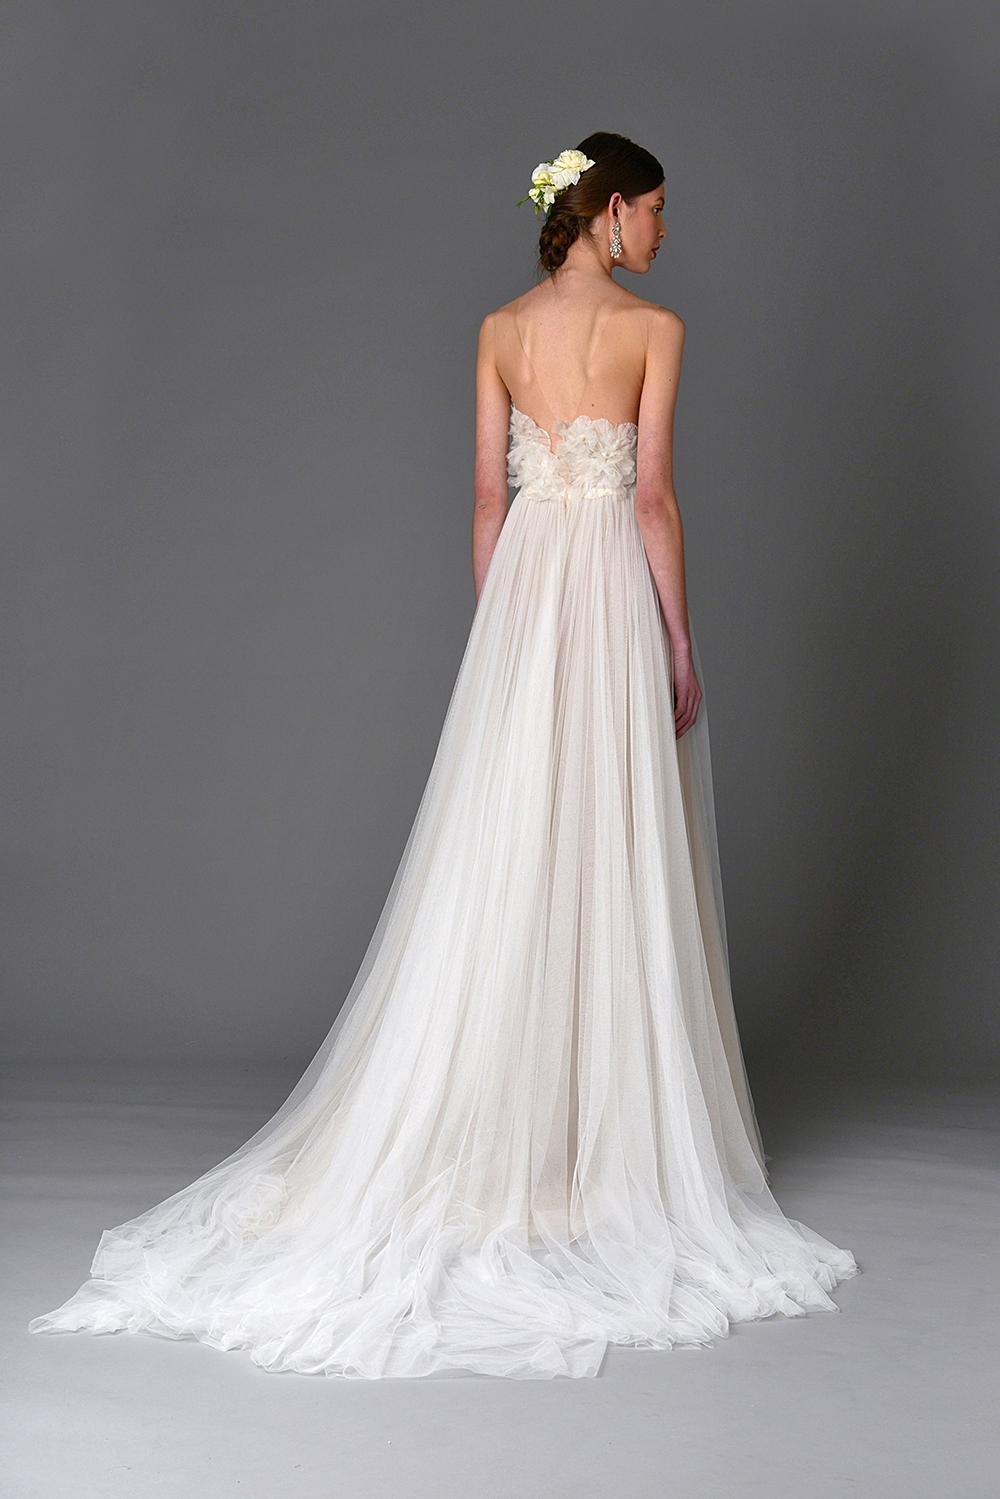 Marchesa Spring 2017 Bridal Collection. www.theweddingnotebook.com